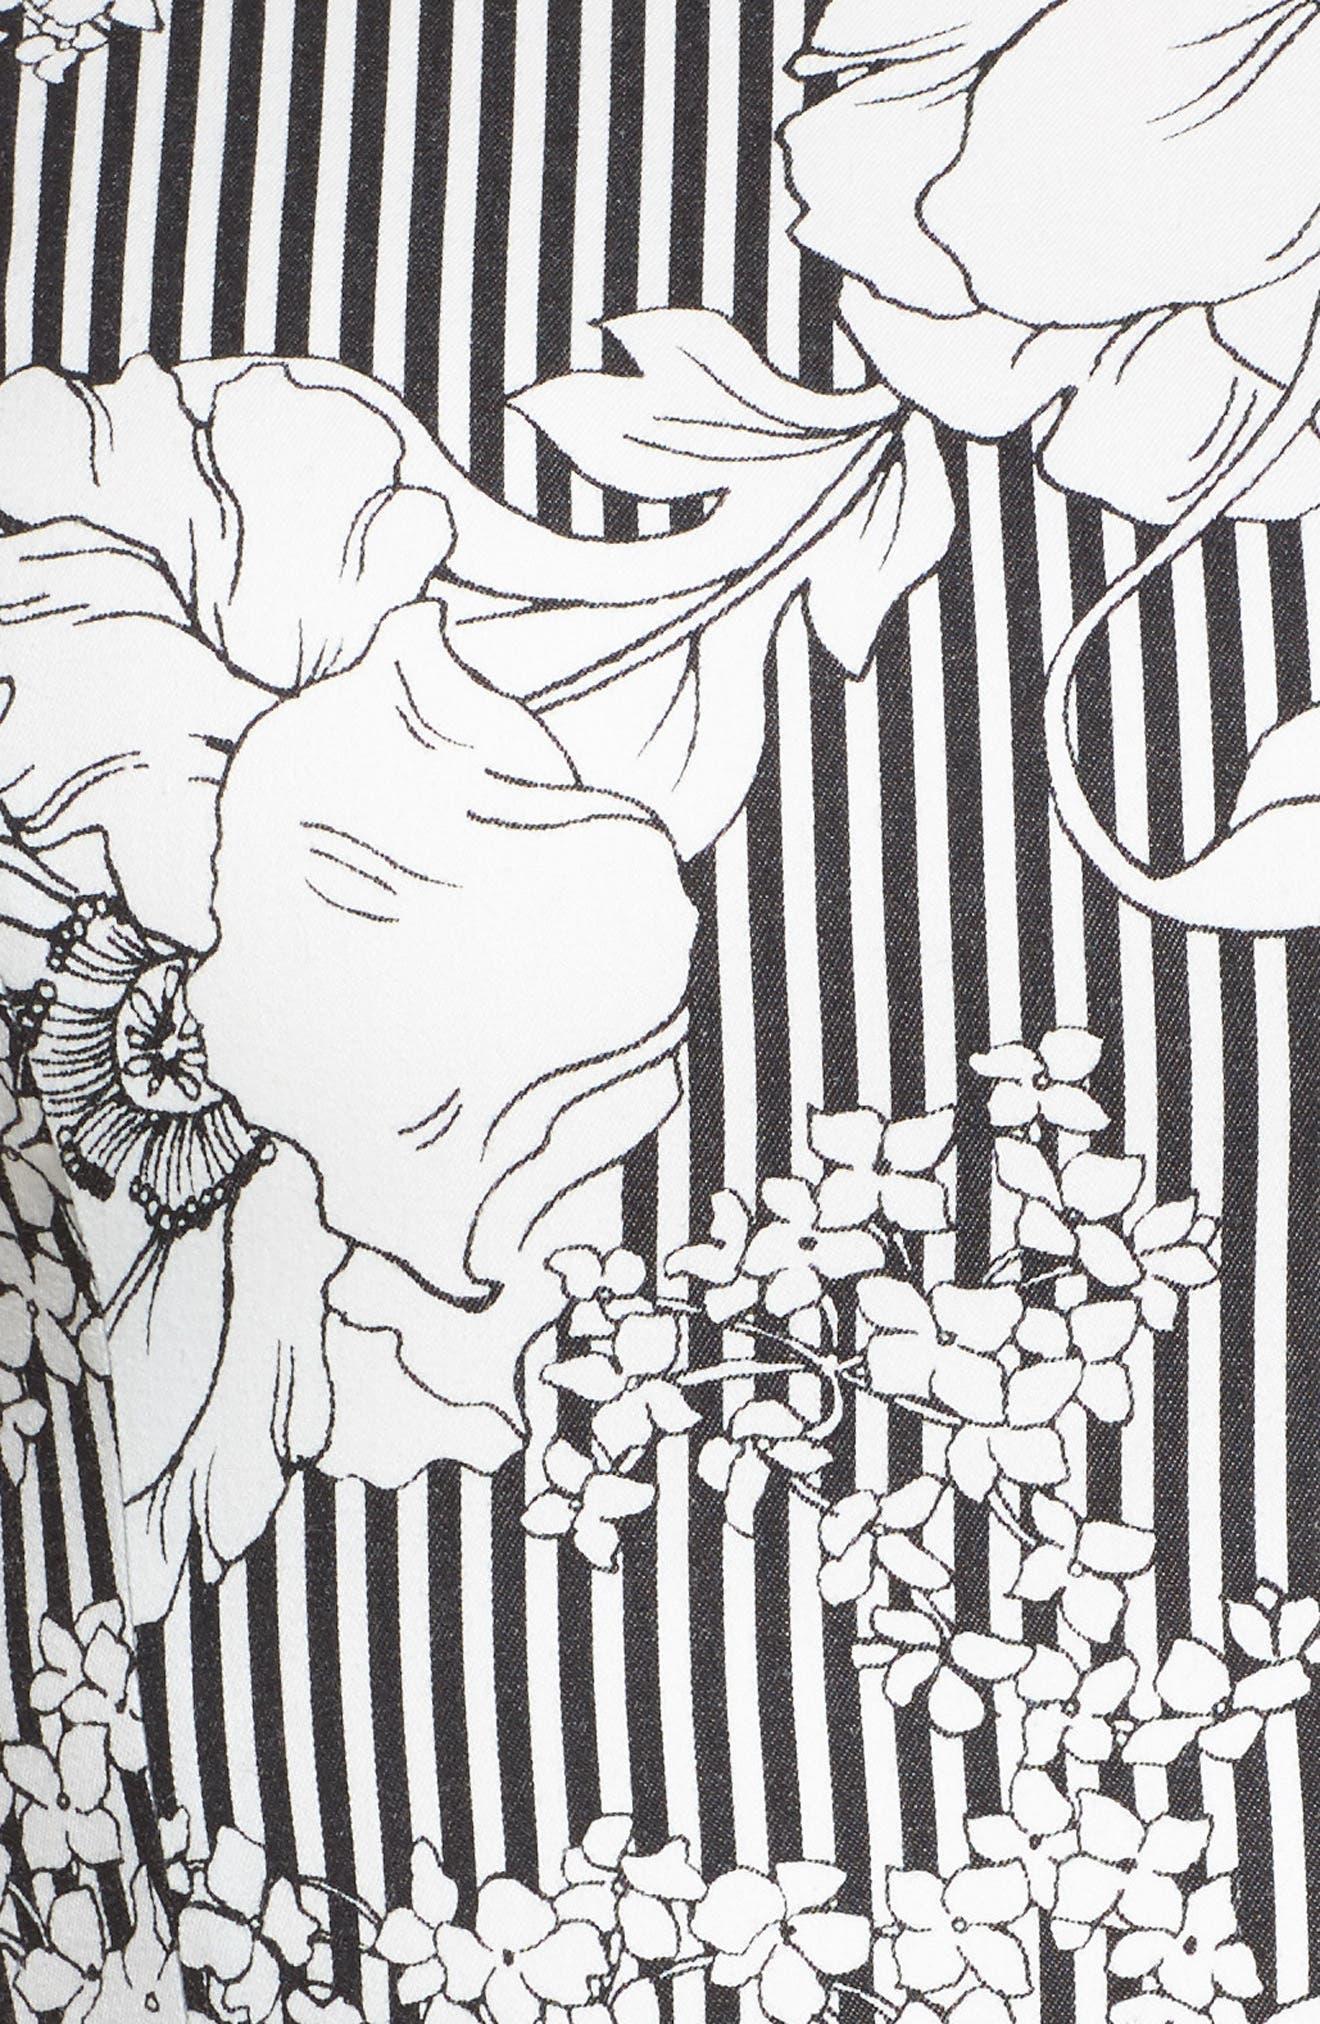 Floral Asymmetrical Ruffle Dress,                             Alternate thumbnail 5, color,                             Black White Floral